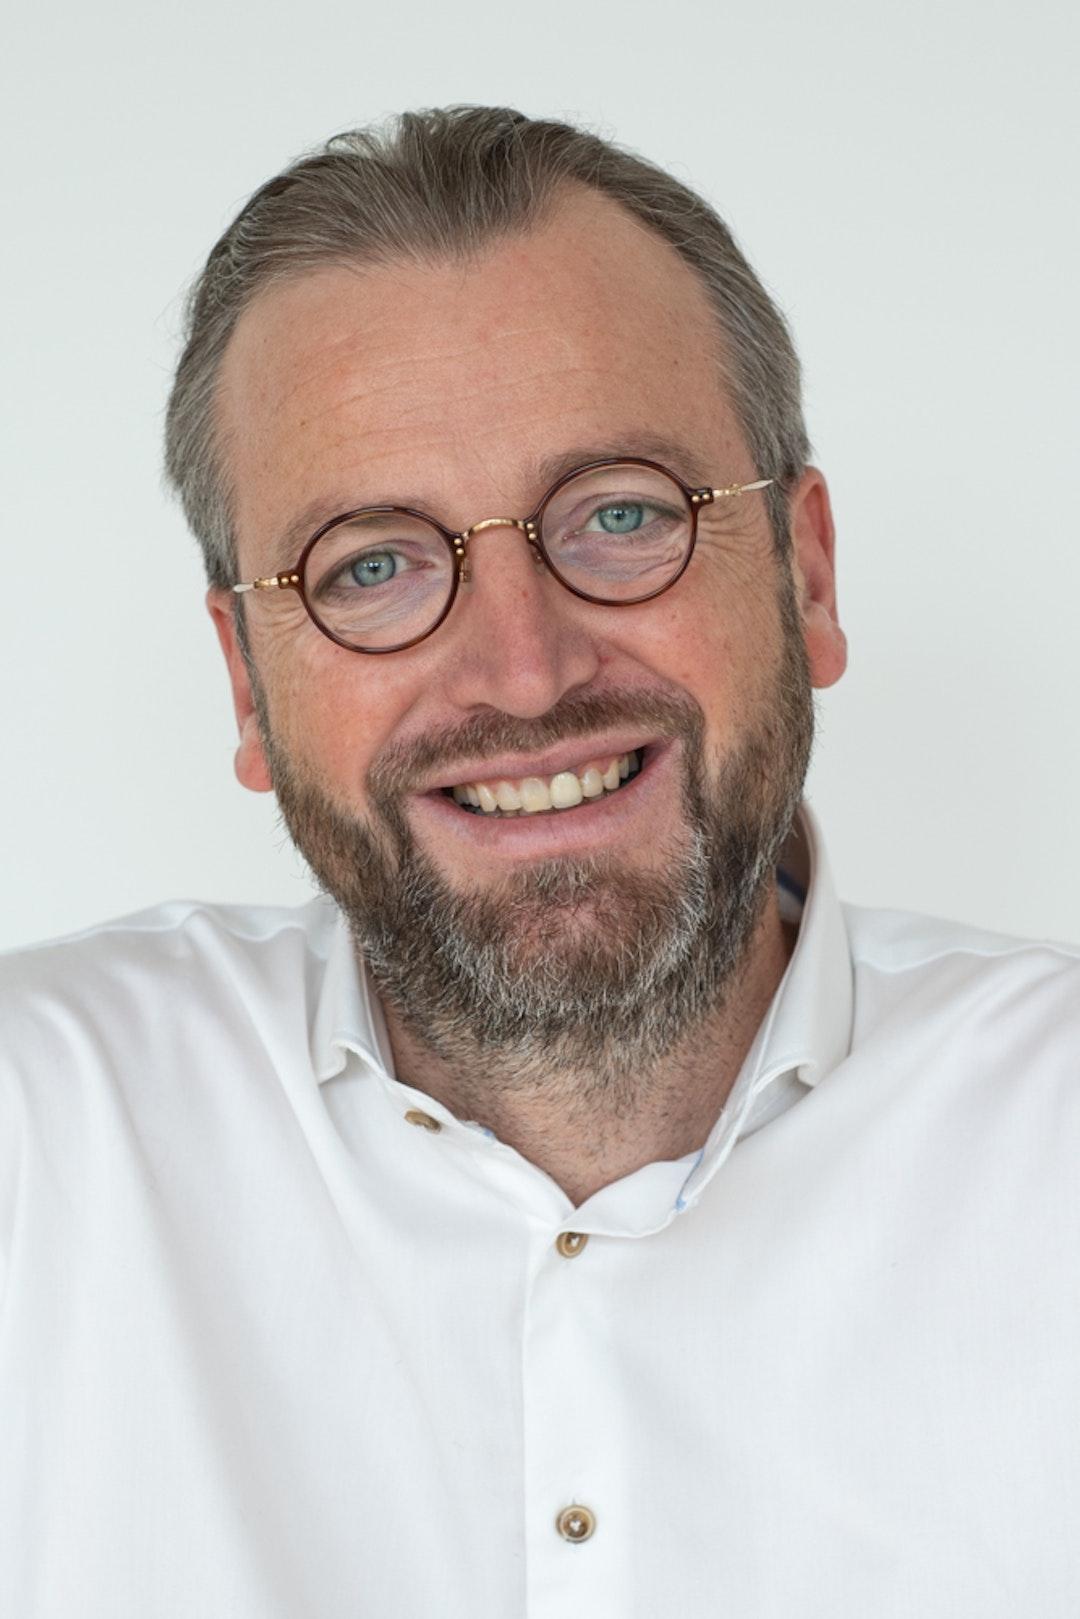 Jean-Marc Meilleur